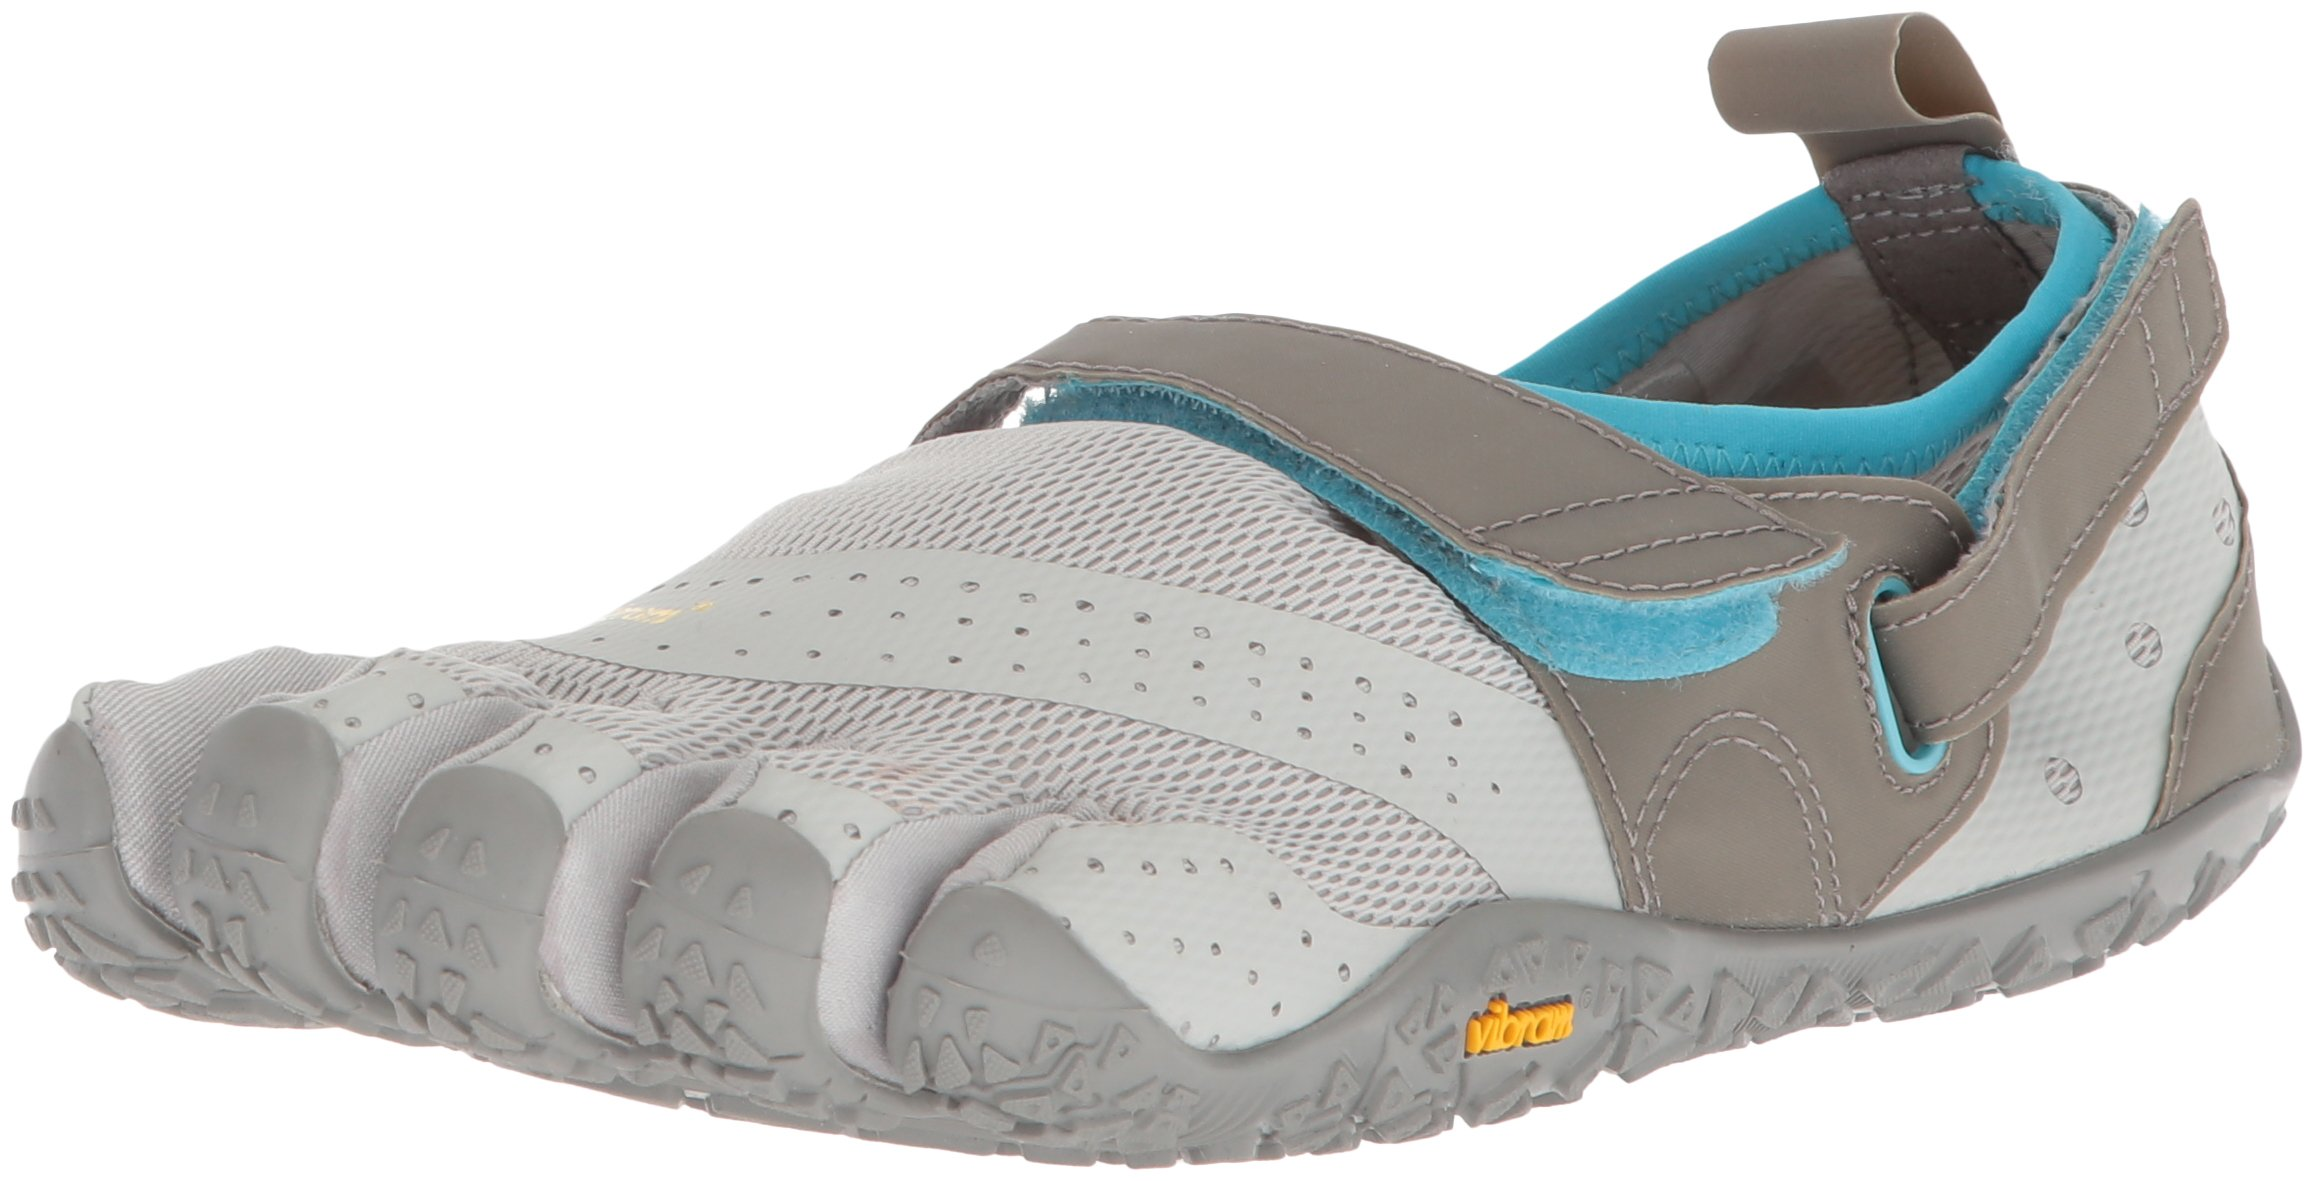 Vibram Women's V-Aqua Water Shoe, Grey/Blue, 42 EU/9-9.5 M US B EU (42 EU/9-9.5 US US)